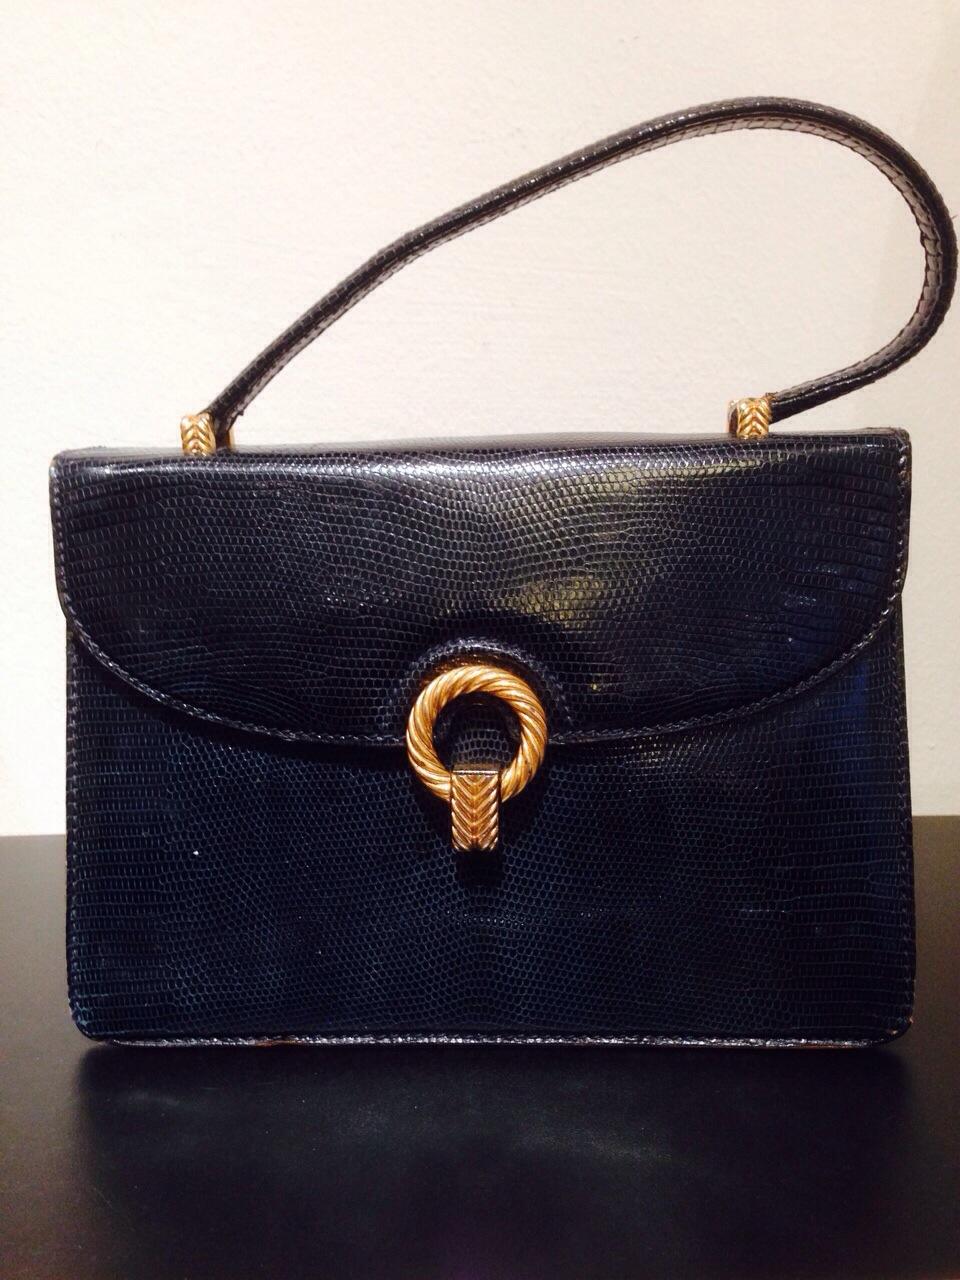 Gucci Väska